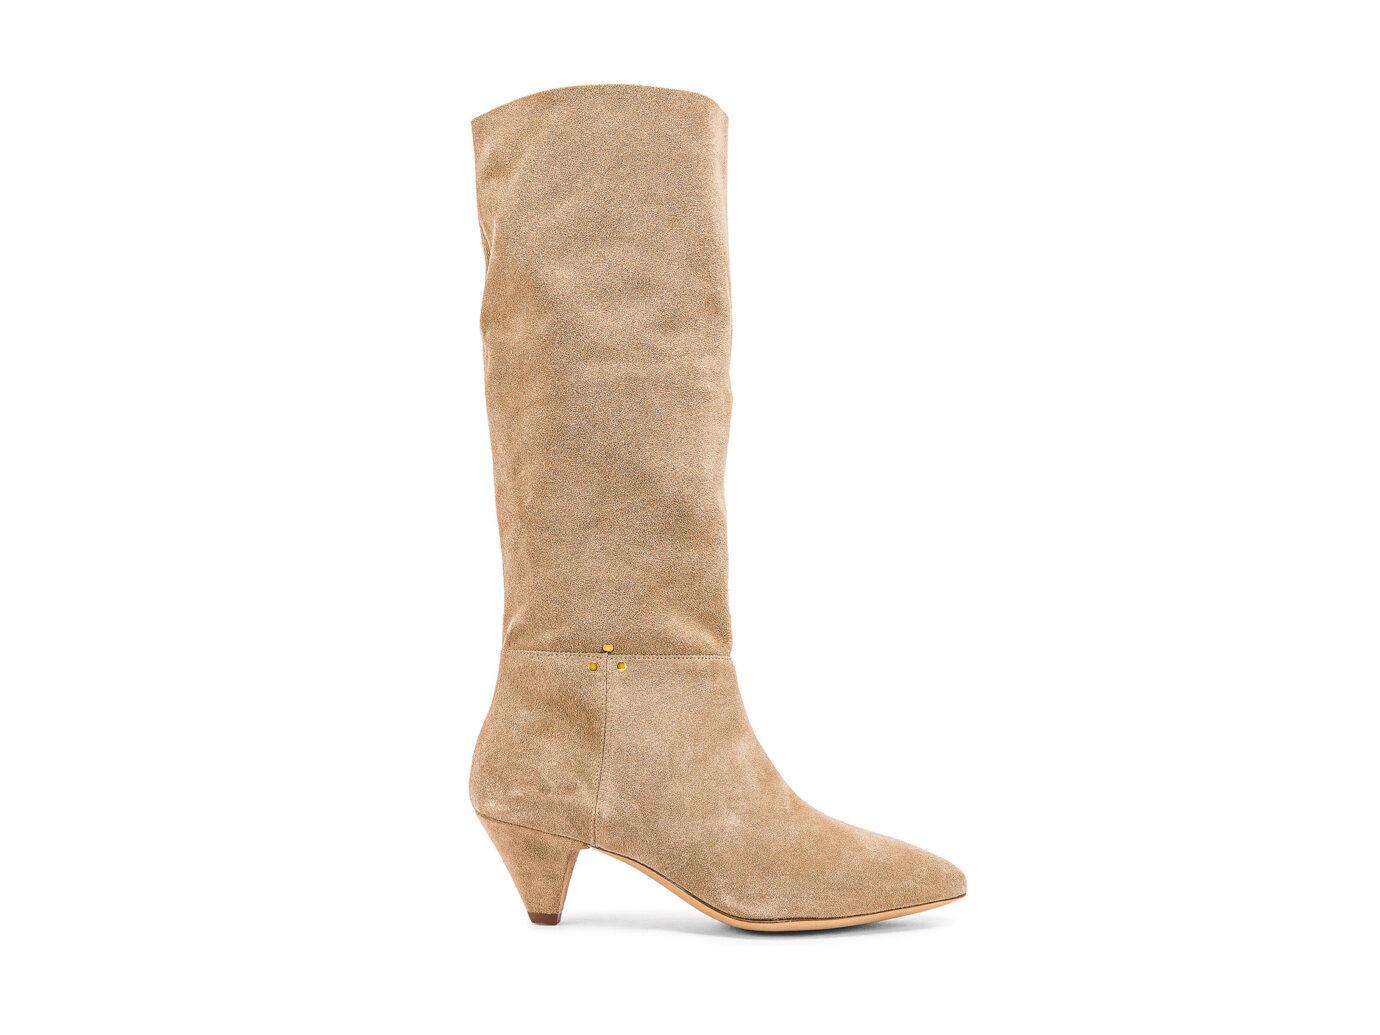 Jerome Dreyfuss Sandie 50 Boot